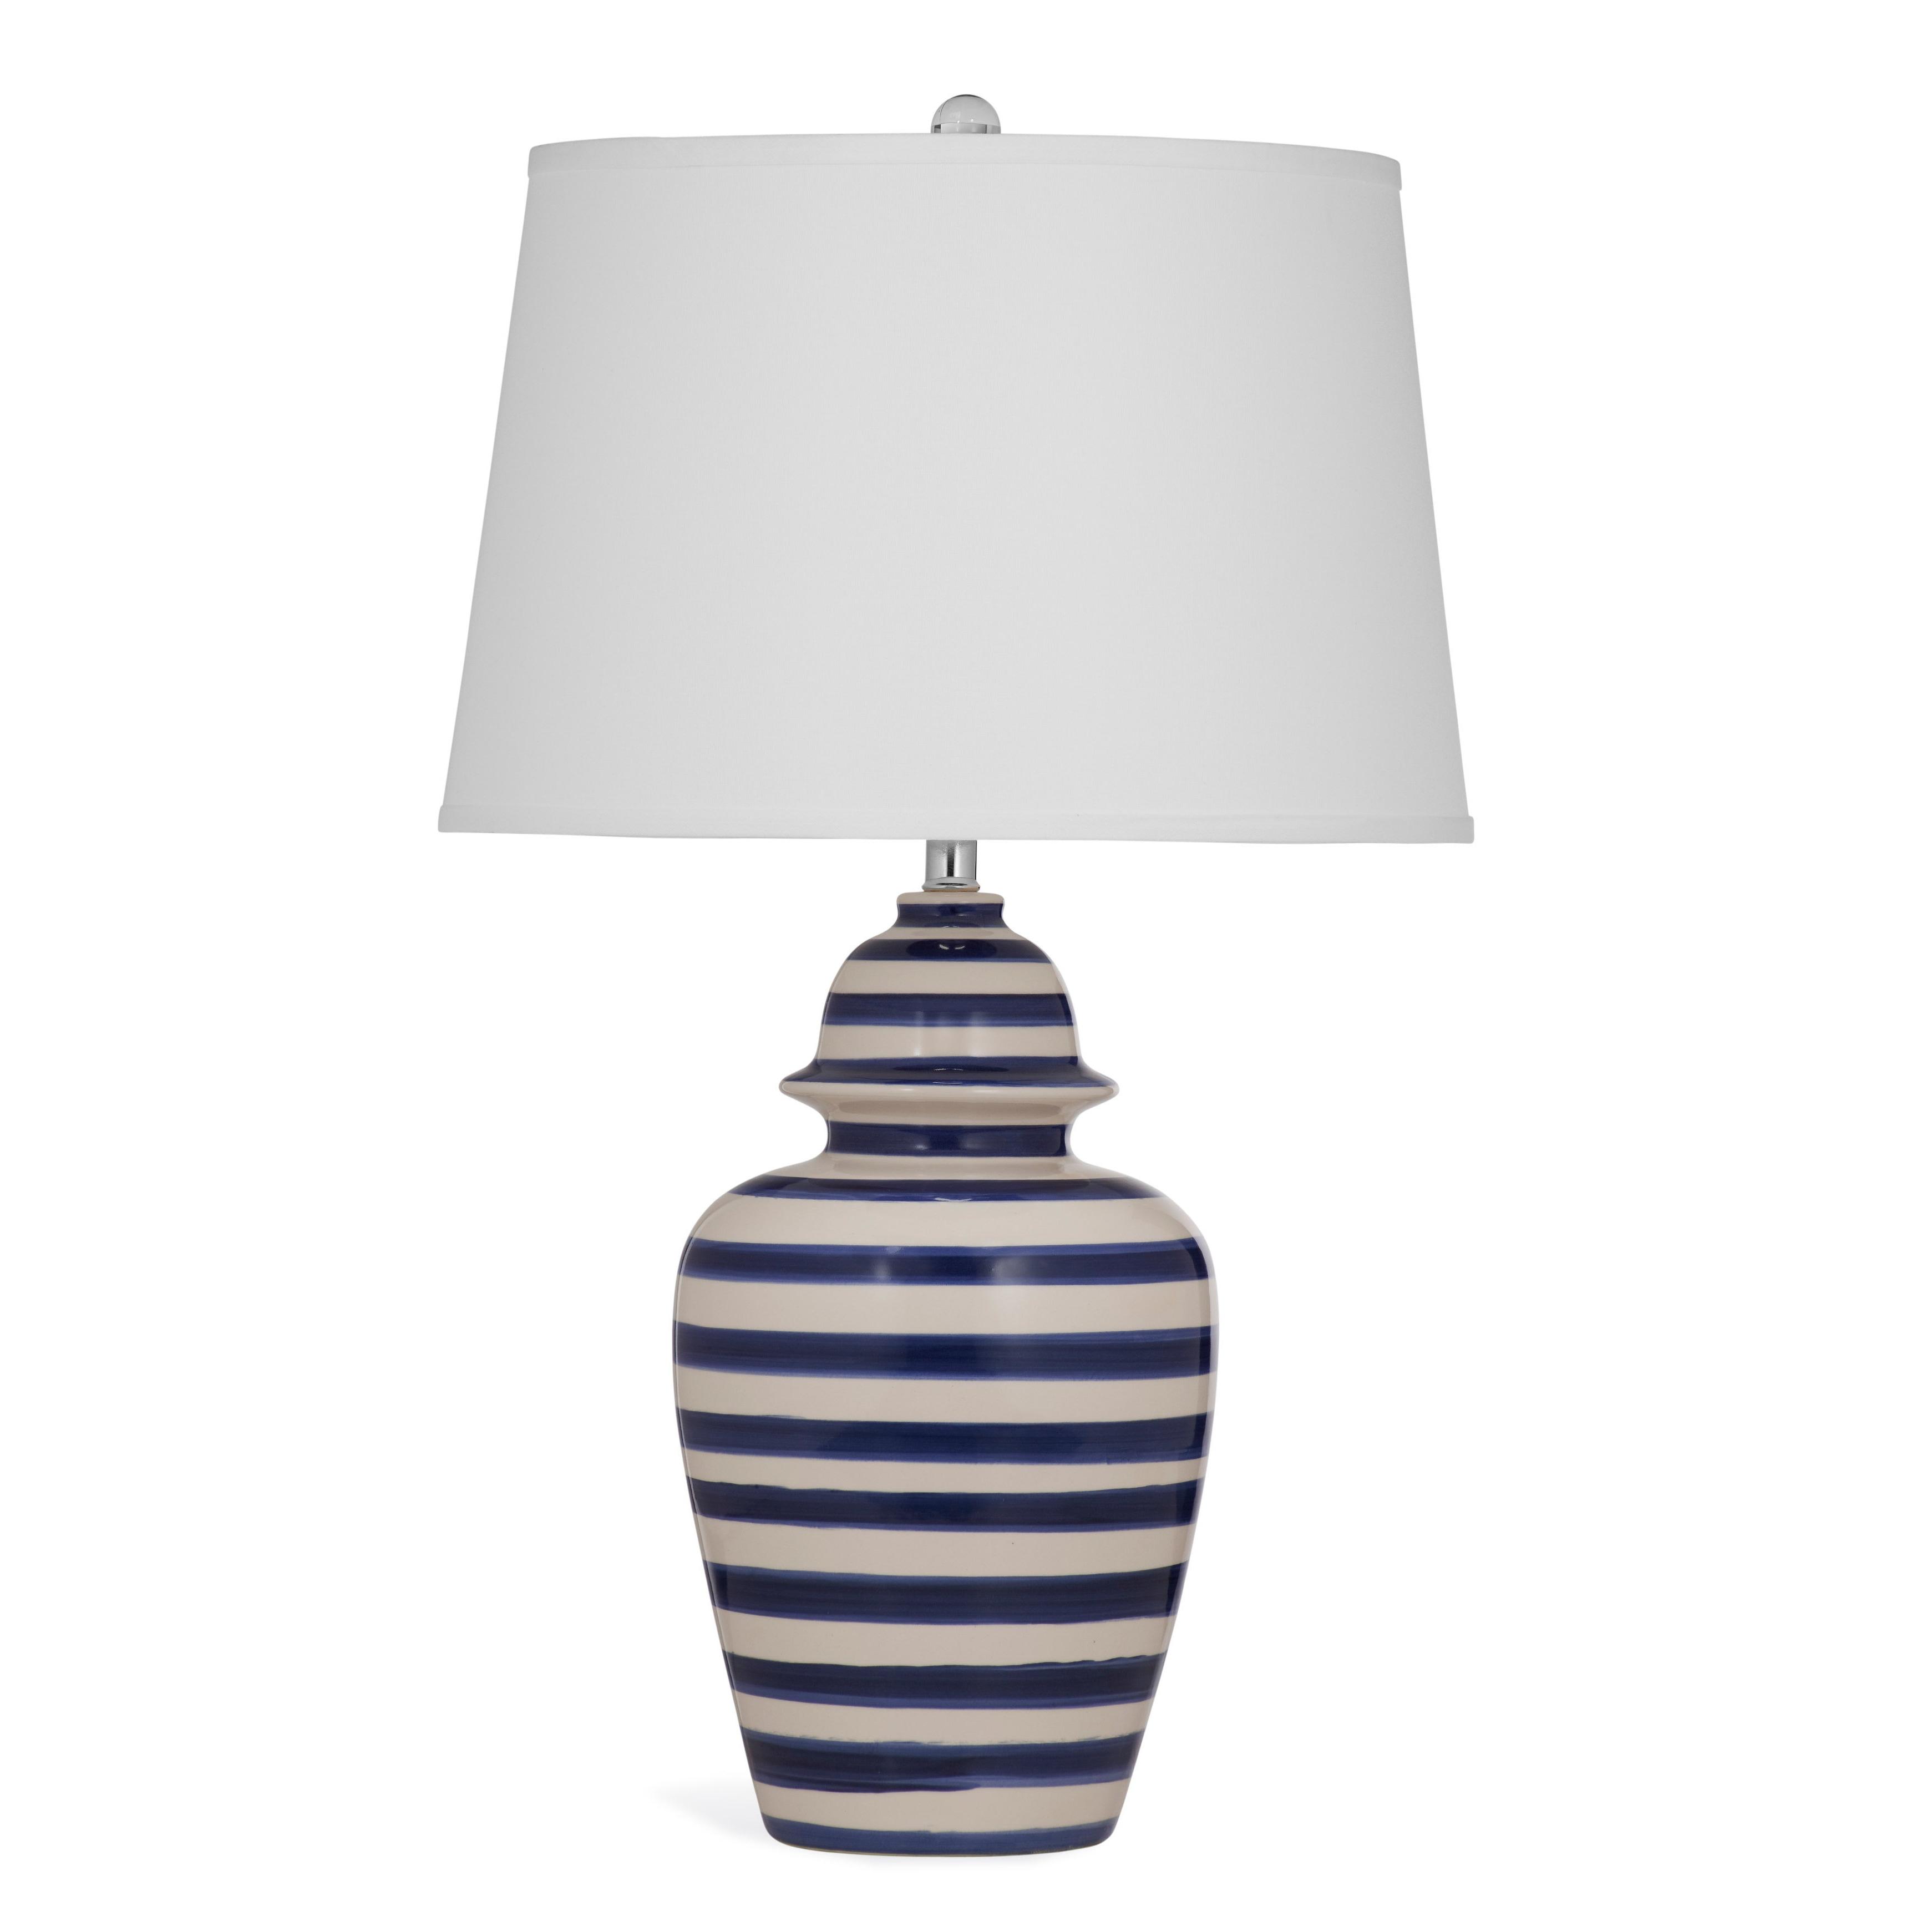 Nautical Coastal Ceramic Table Lamps Find Great